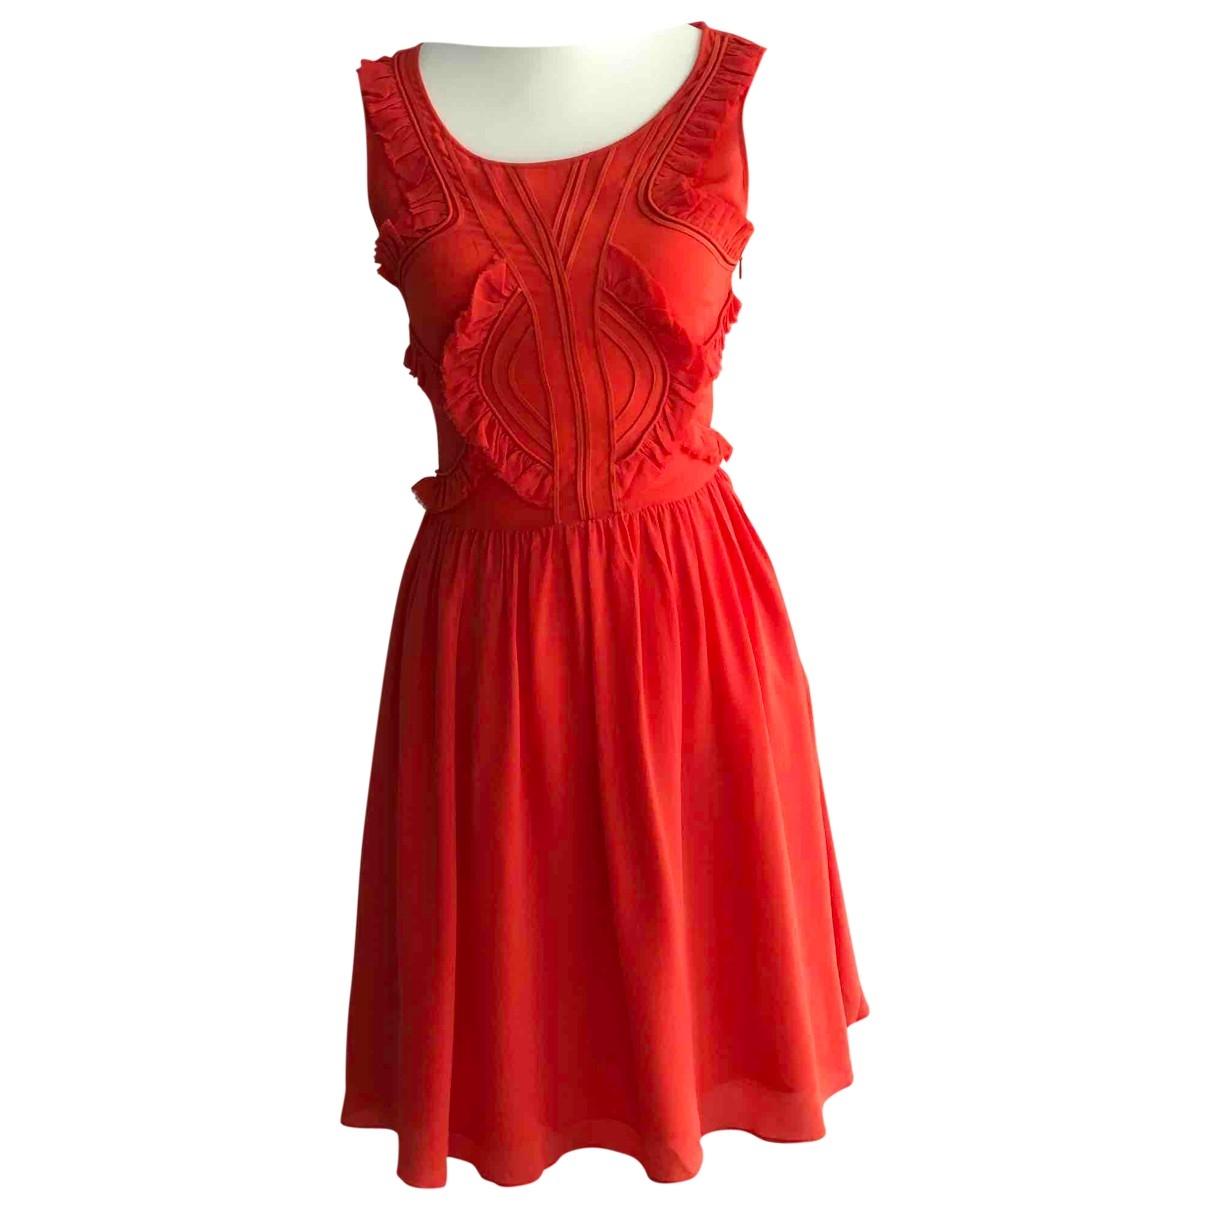 Reiss - Robe   pour femme en soie - orange